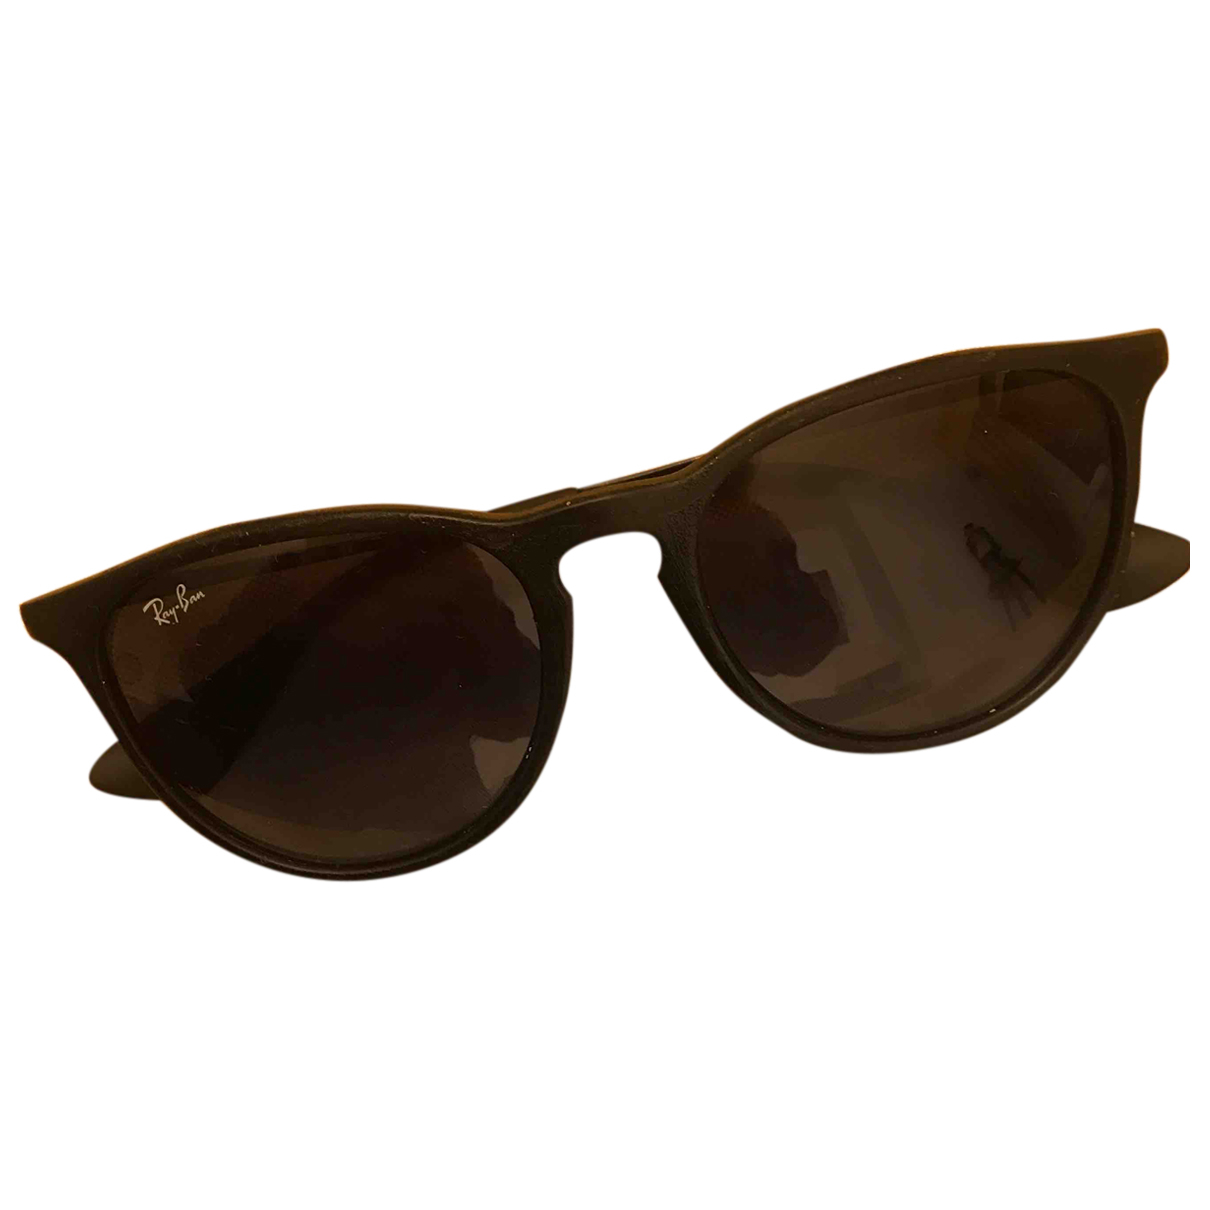 Ray-ban Erika Grey Sunglasses for Women N